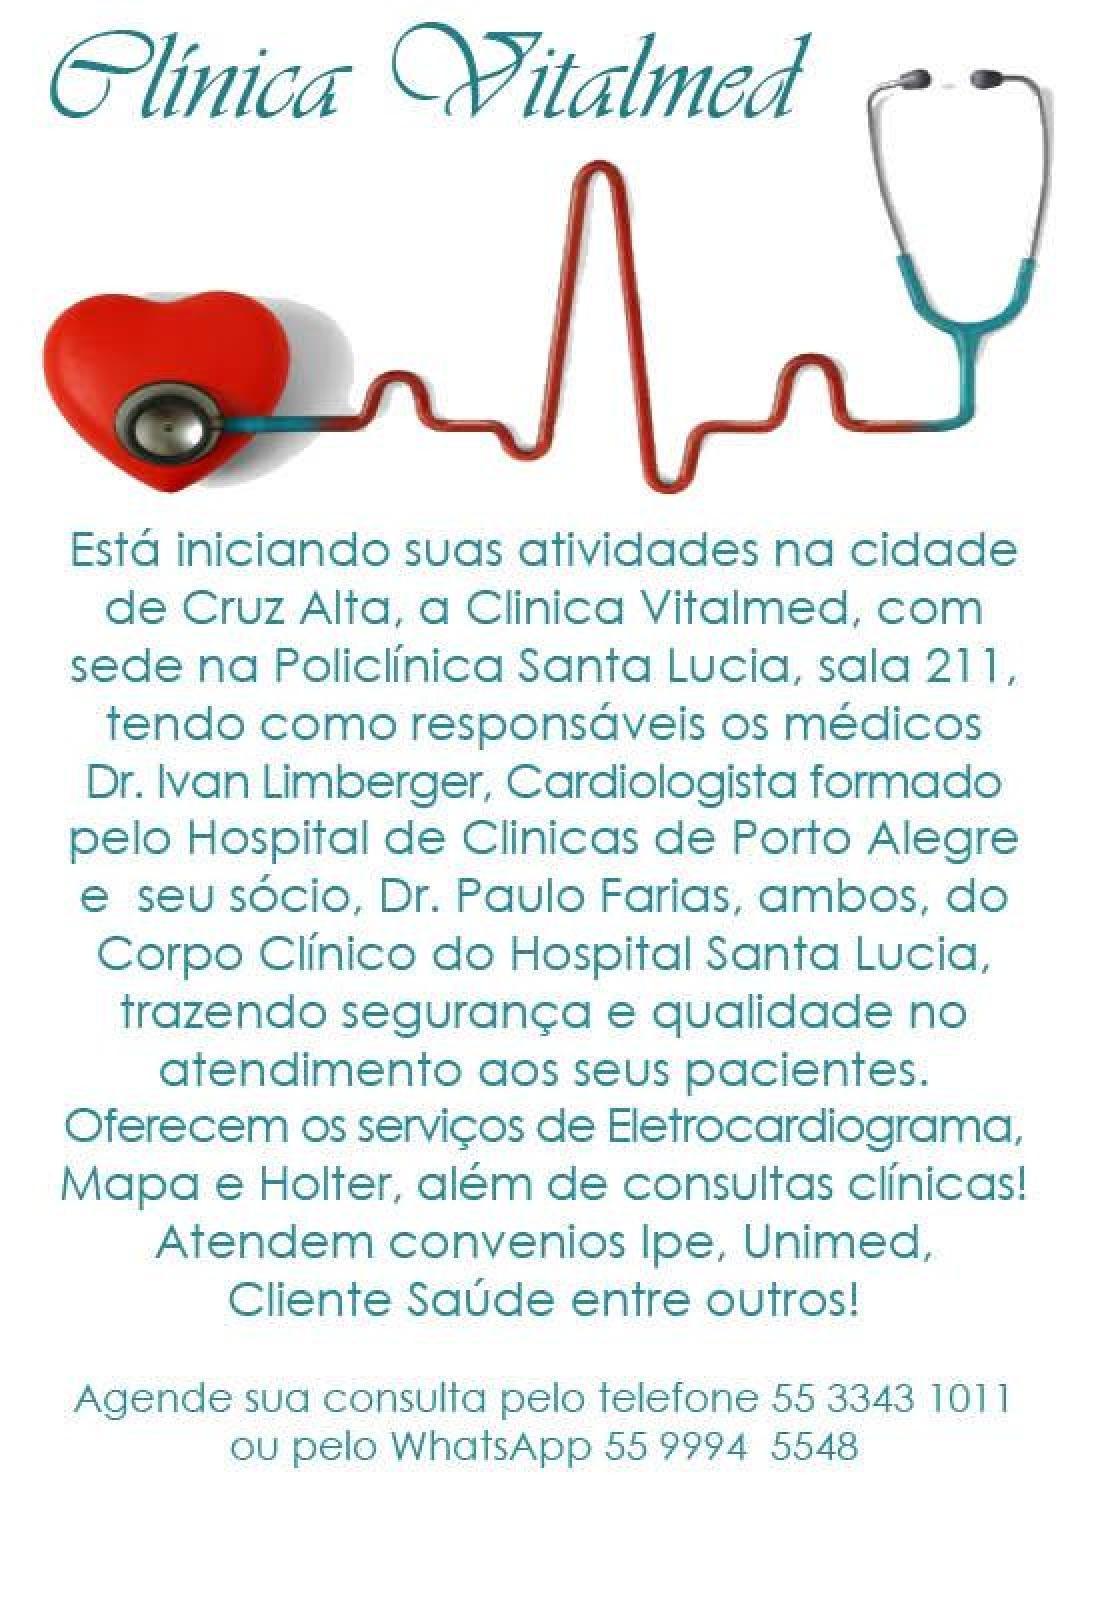 Clinica Vitalmed